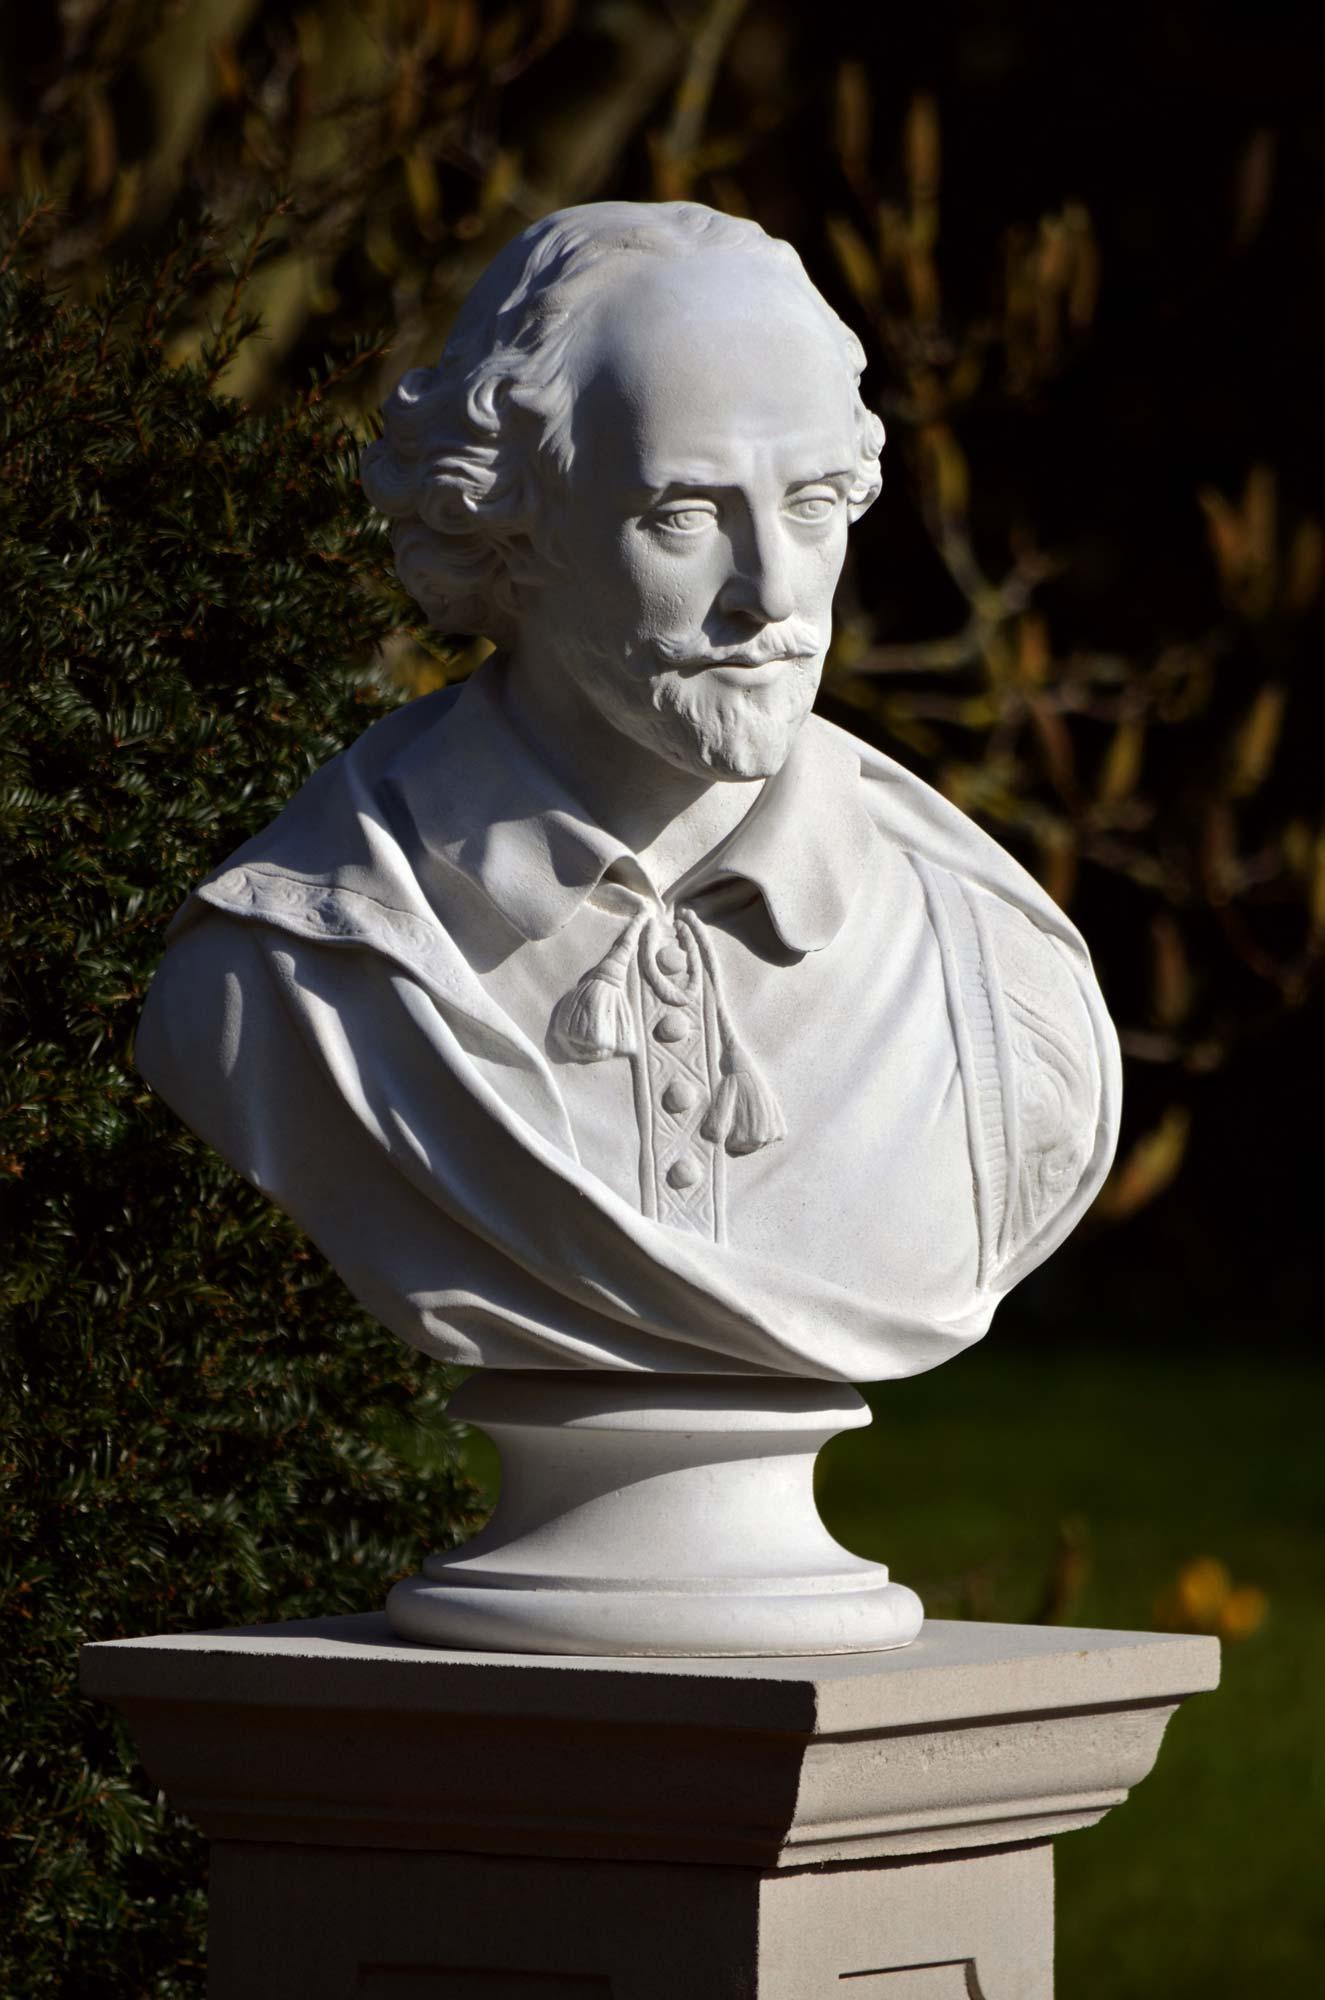 Reconstituted Stone Outdoor Garden Statue Ornament William Shakespeare Bust Art